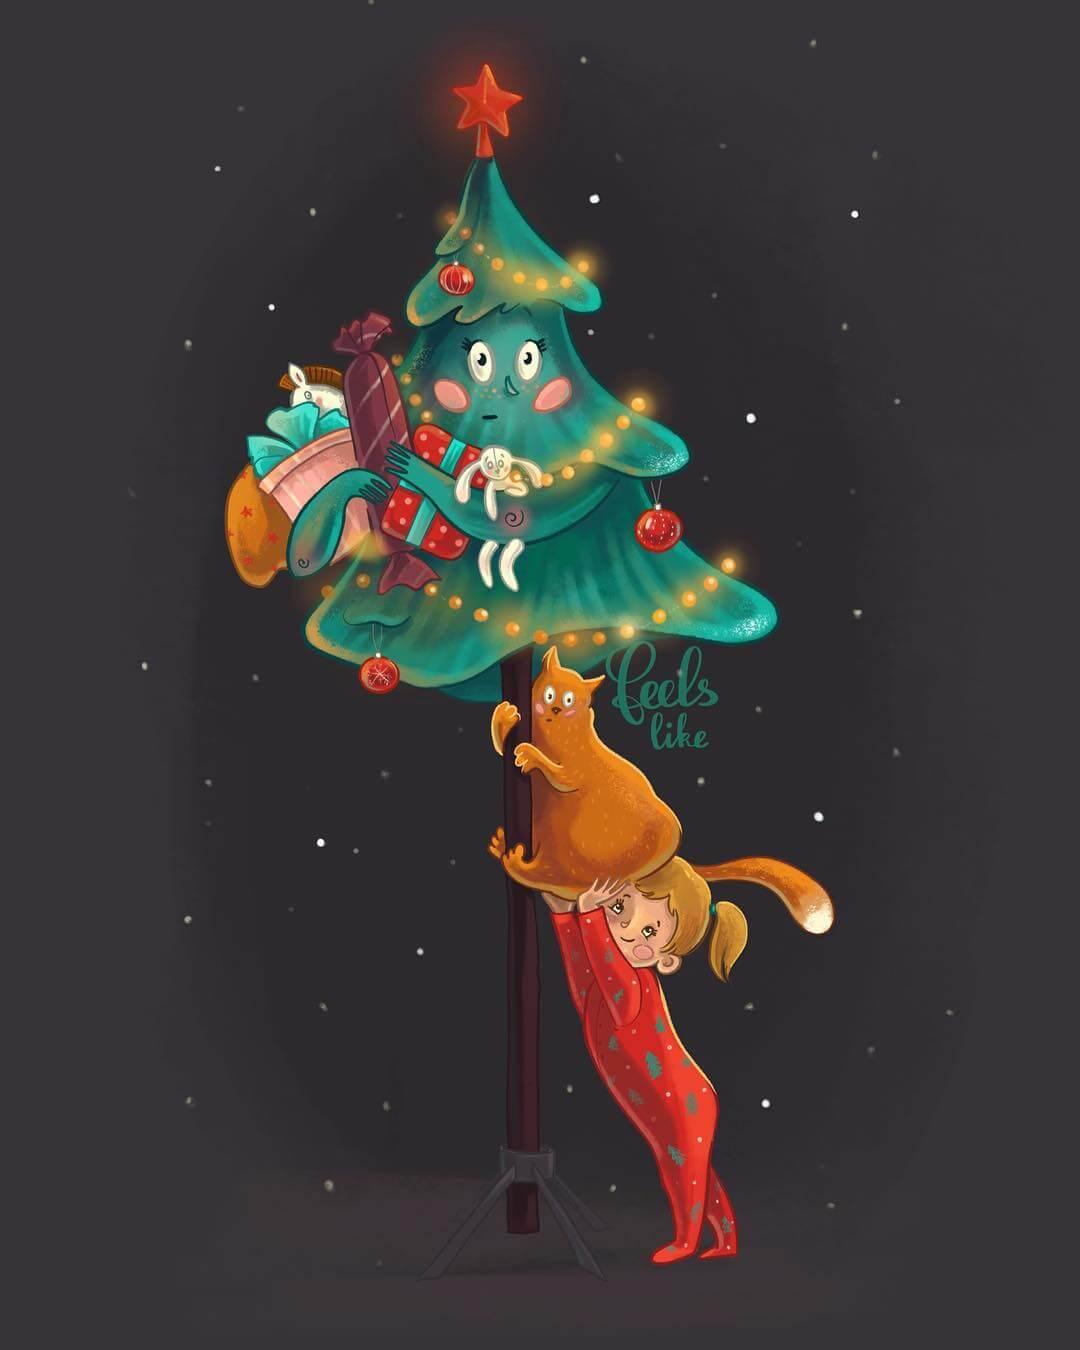 Christmas Tree by Feels like via Instagram